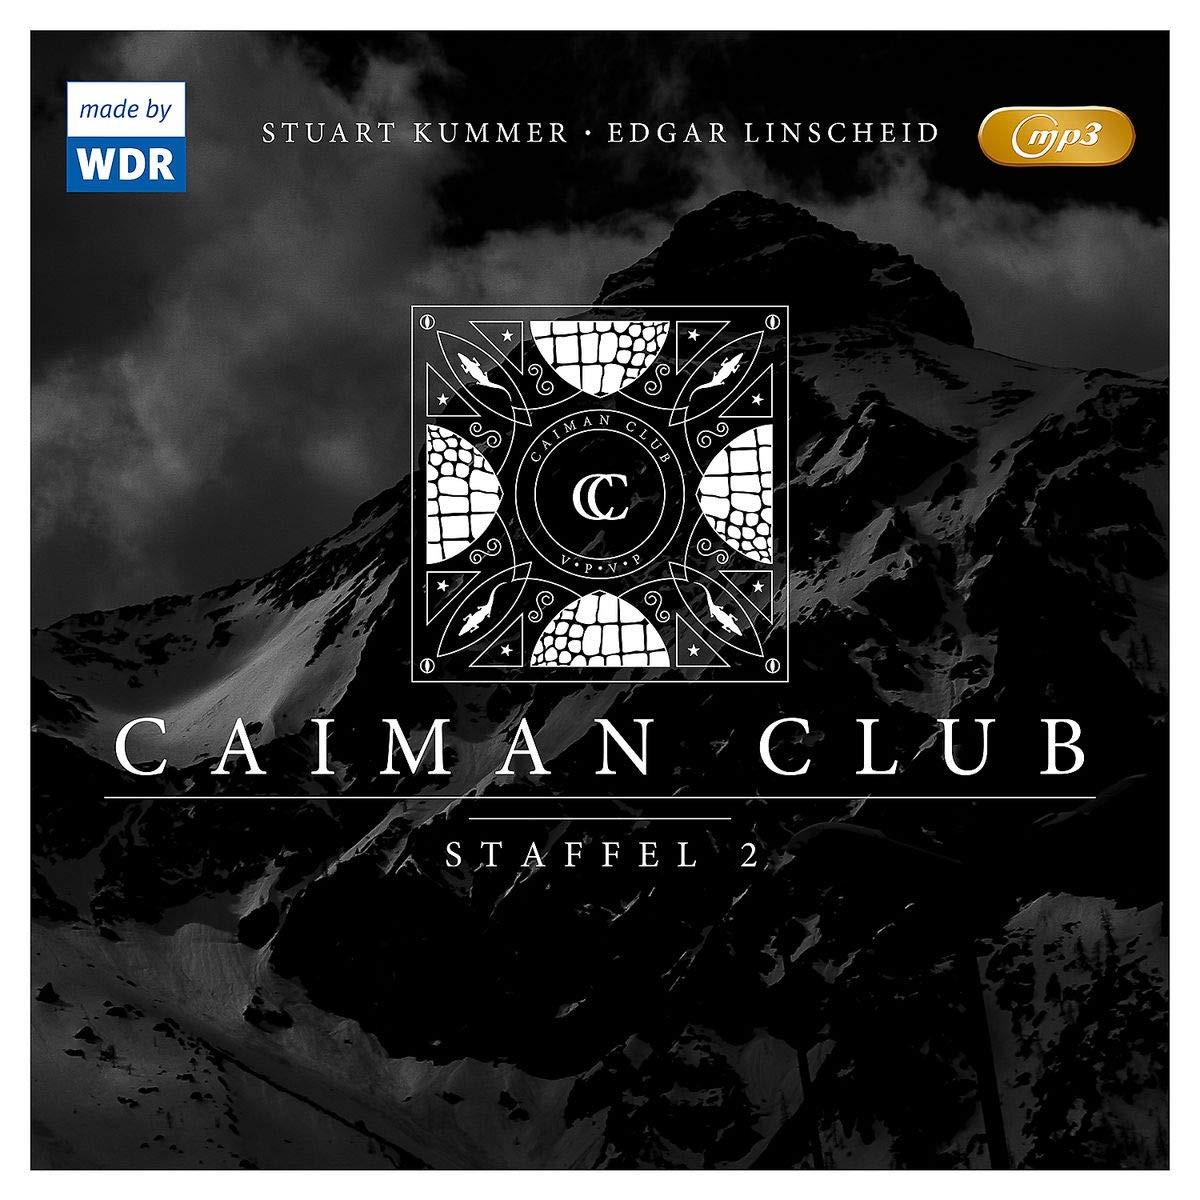 Caiman Club - Staffel 2 (Folgen 06-09)